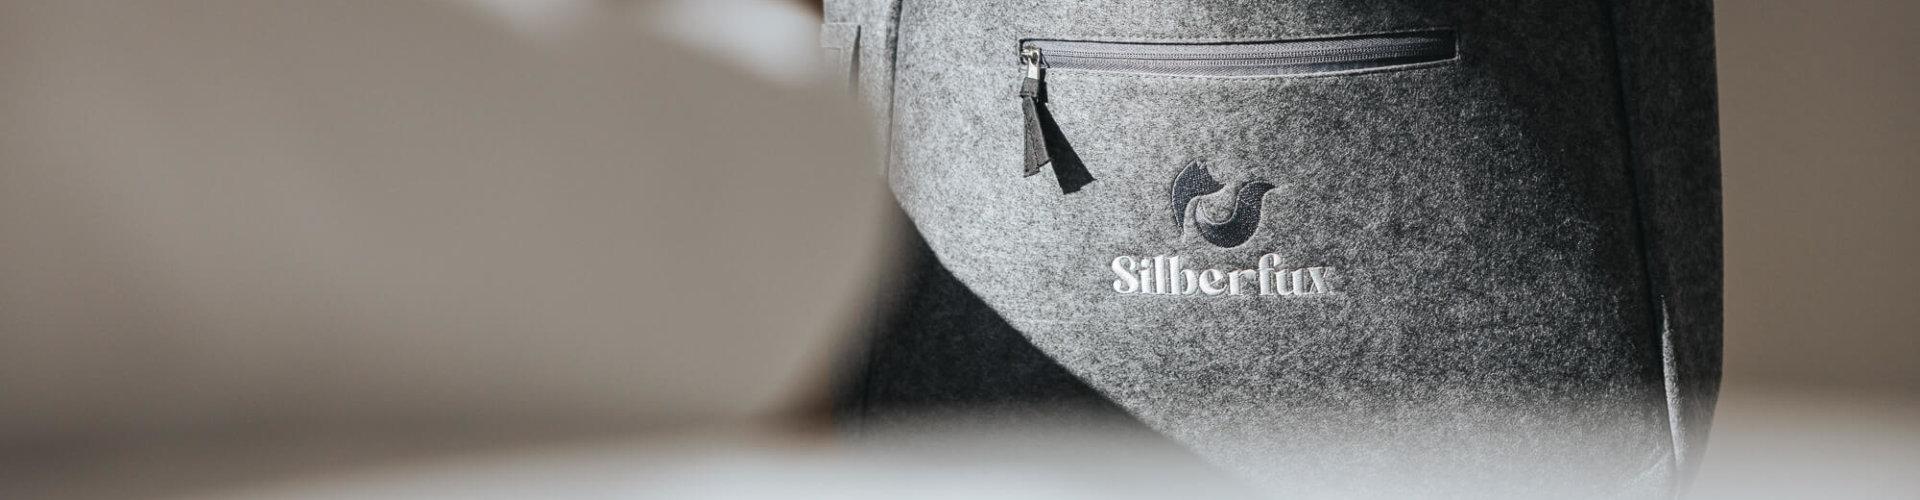 Hotel Silberfux - Wellness Tasche